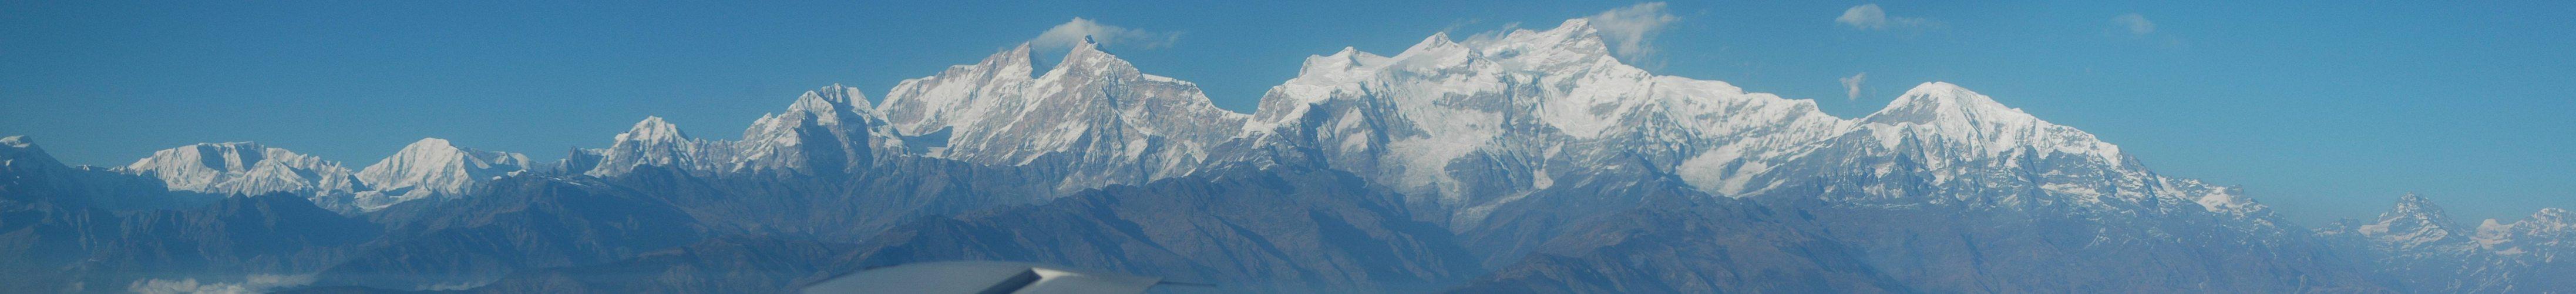 flight kathmandu pokhara manaslu himal ¦ Pictures > Nepal > Chitwan